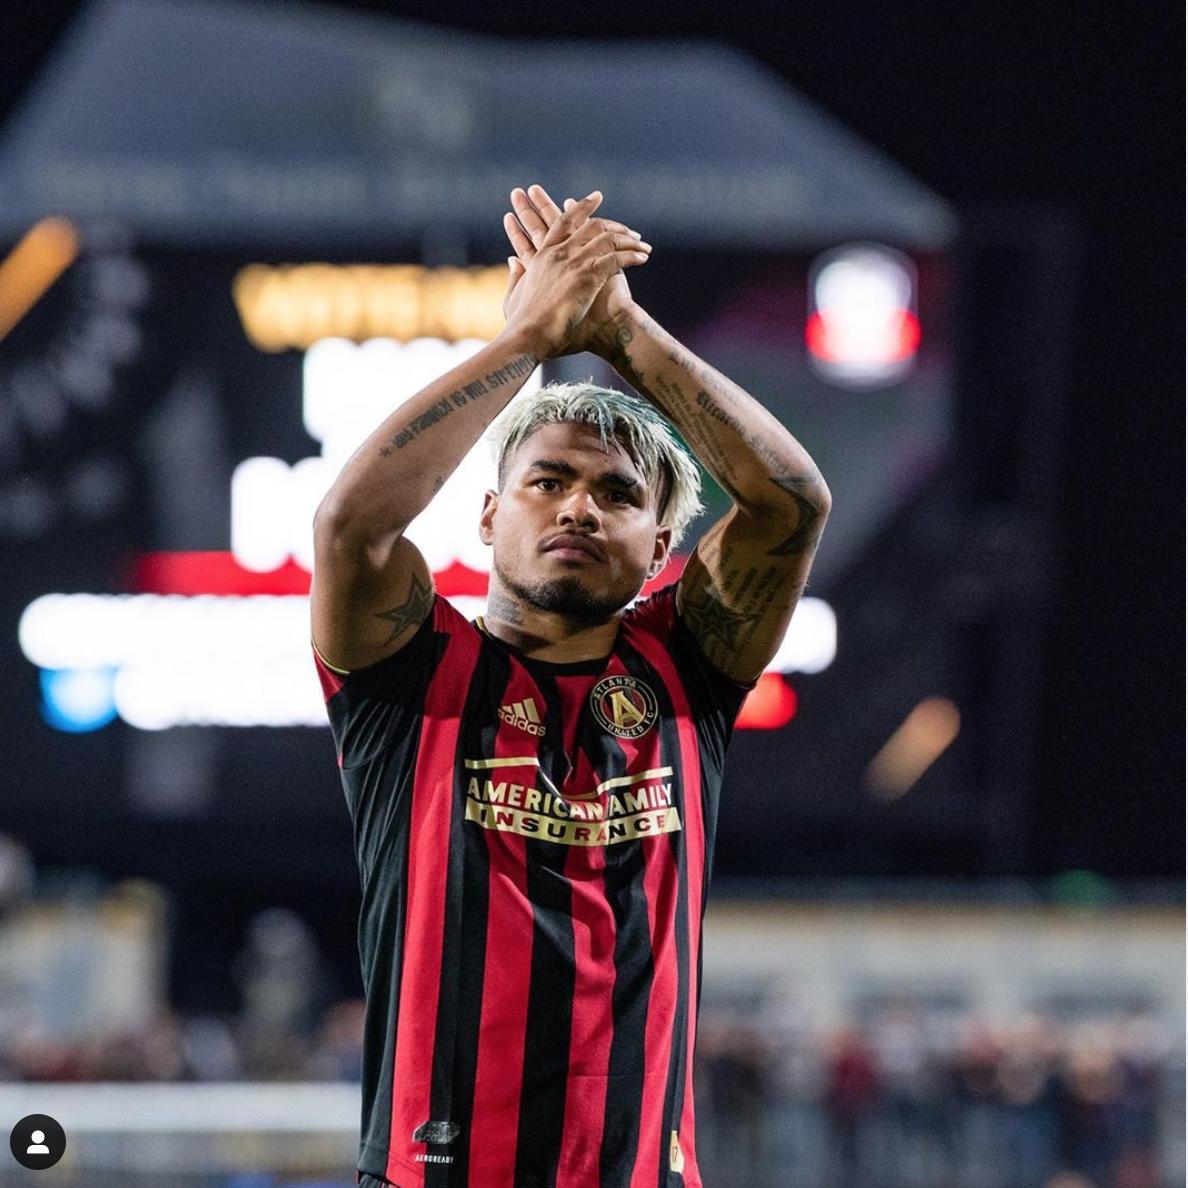 Atlanta United FC finalizes transfer of Josef Martinez